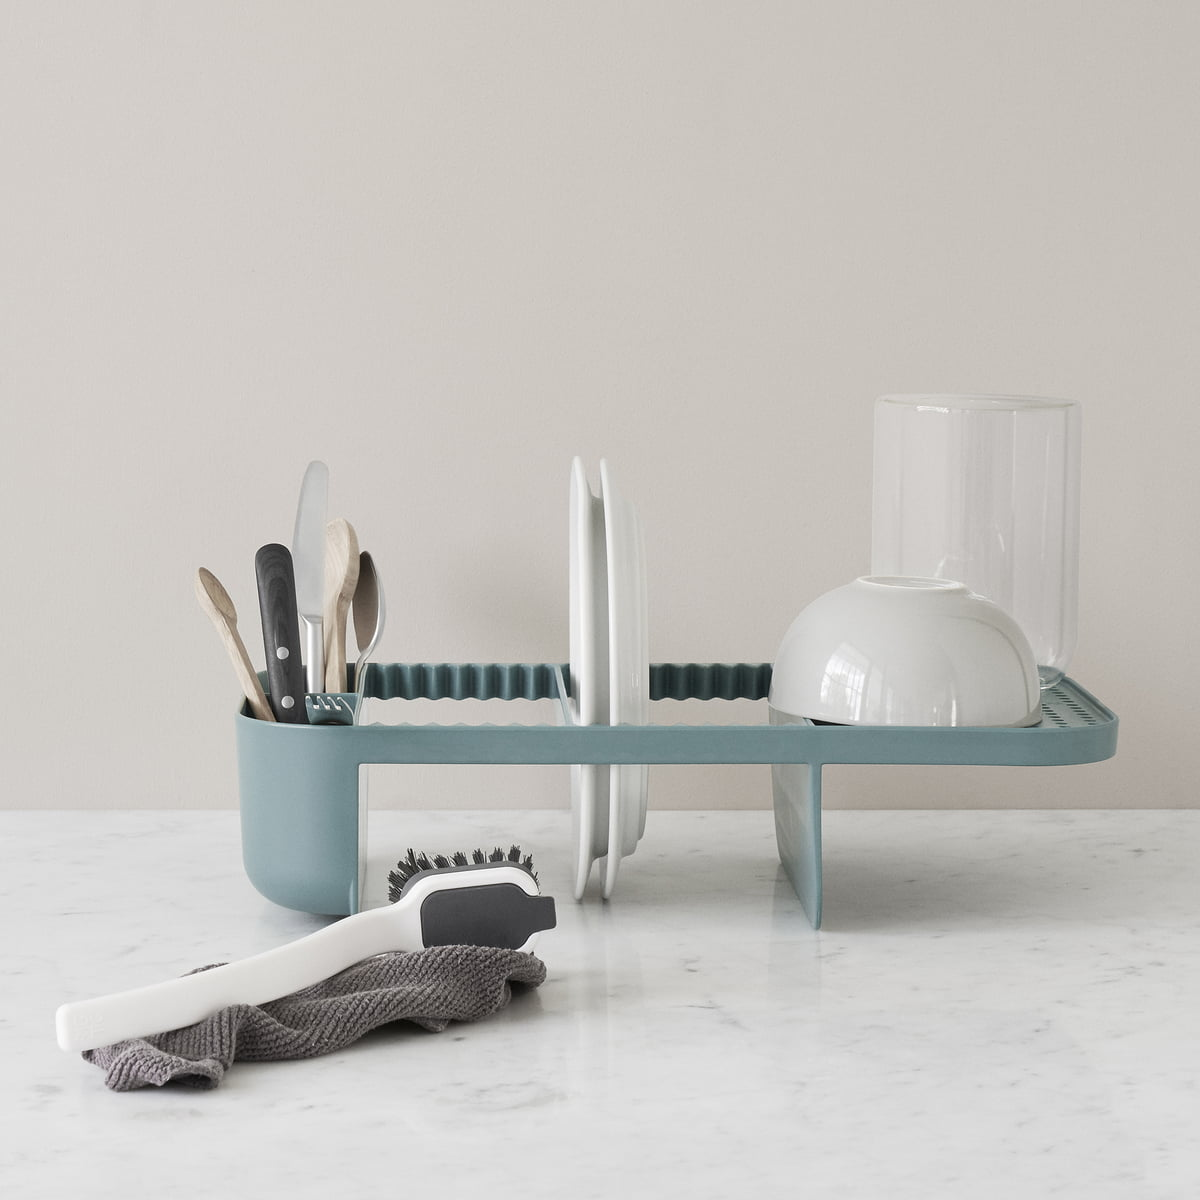 dishy sp lsch ssel und abtropfbrett. Black Bedroom Furniture Sets. Home Design Ideas